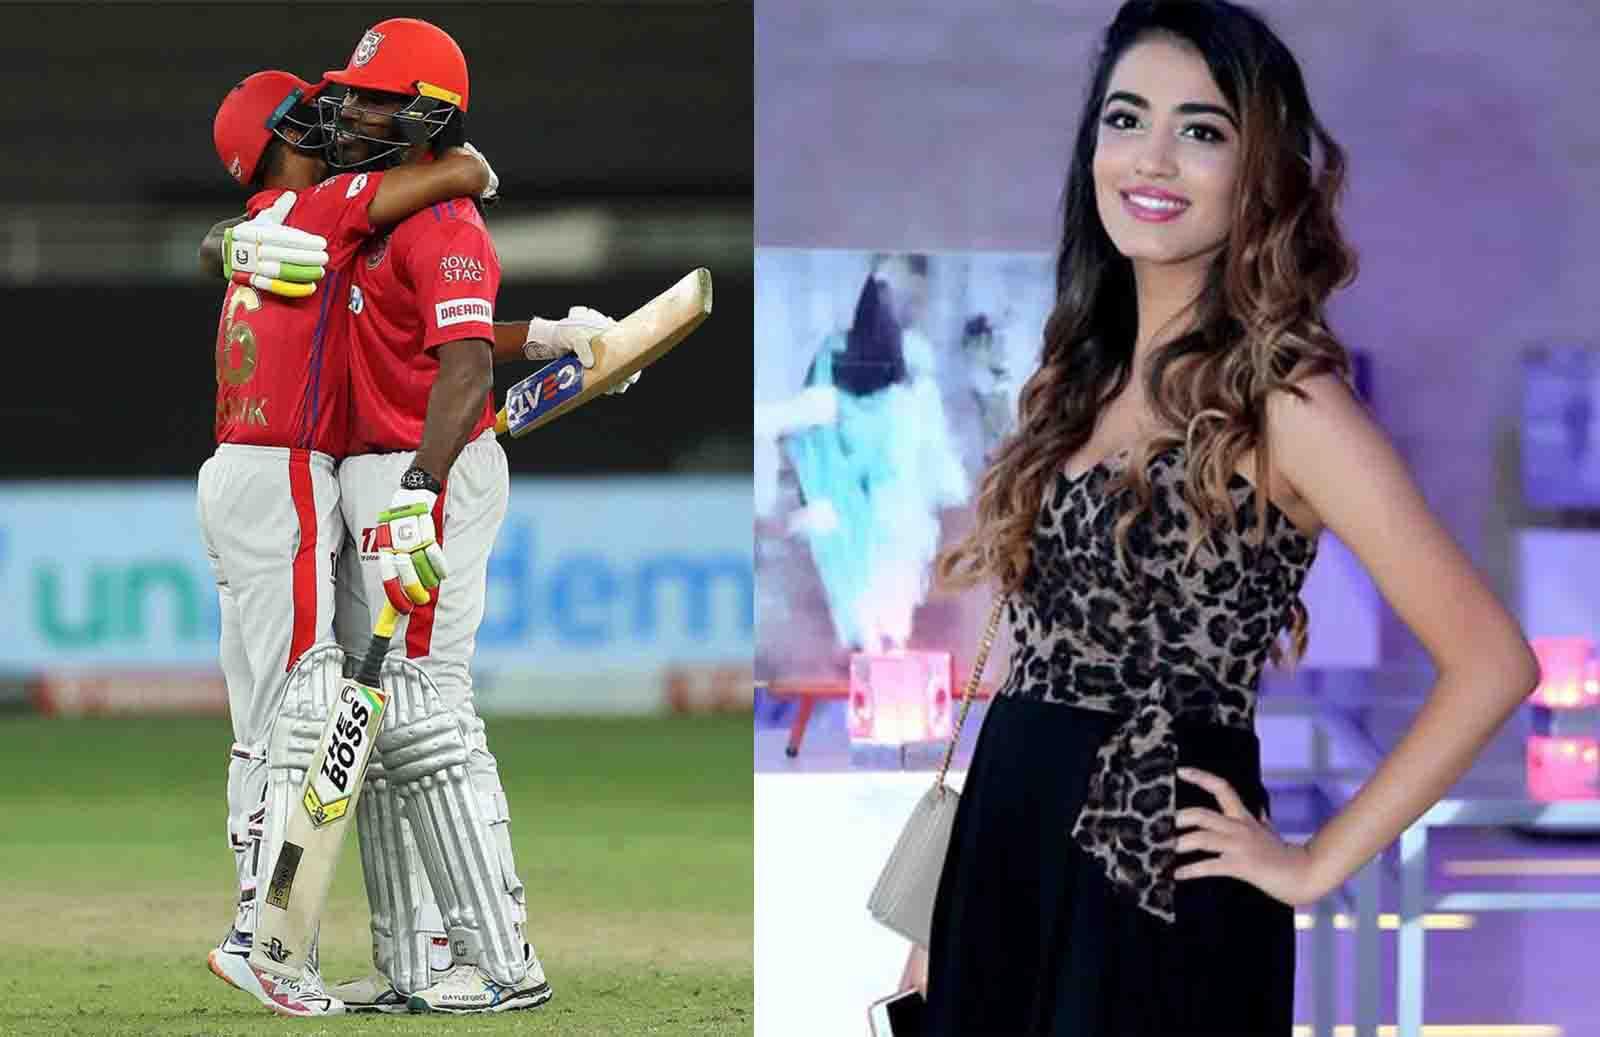 Riana Lalwani, The Mystery Girl Became Social Media Sensation after Kings XI Punjab and Mumbai Indians Game